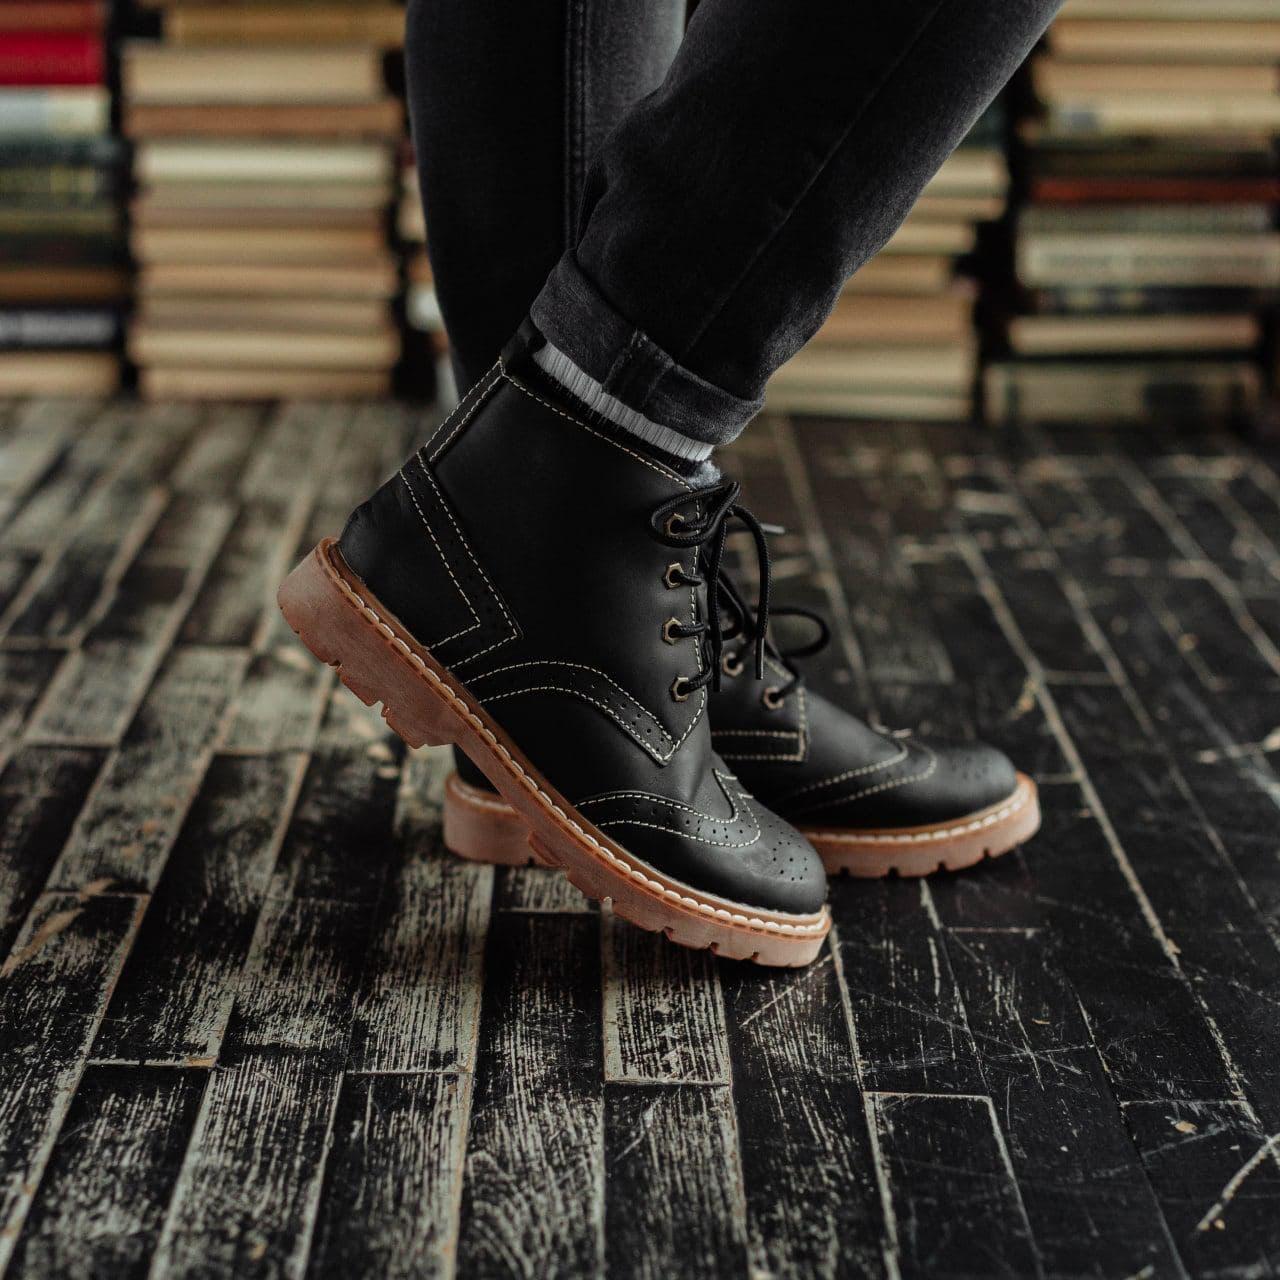 Ботинки South Rebel black - фото 2